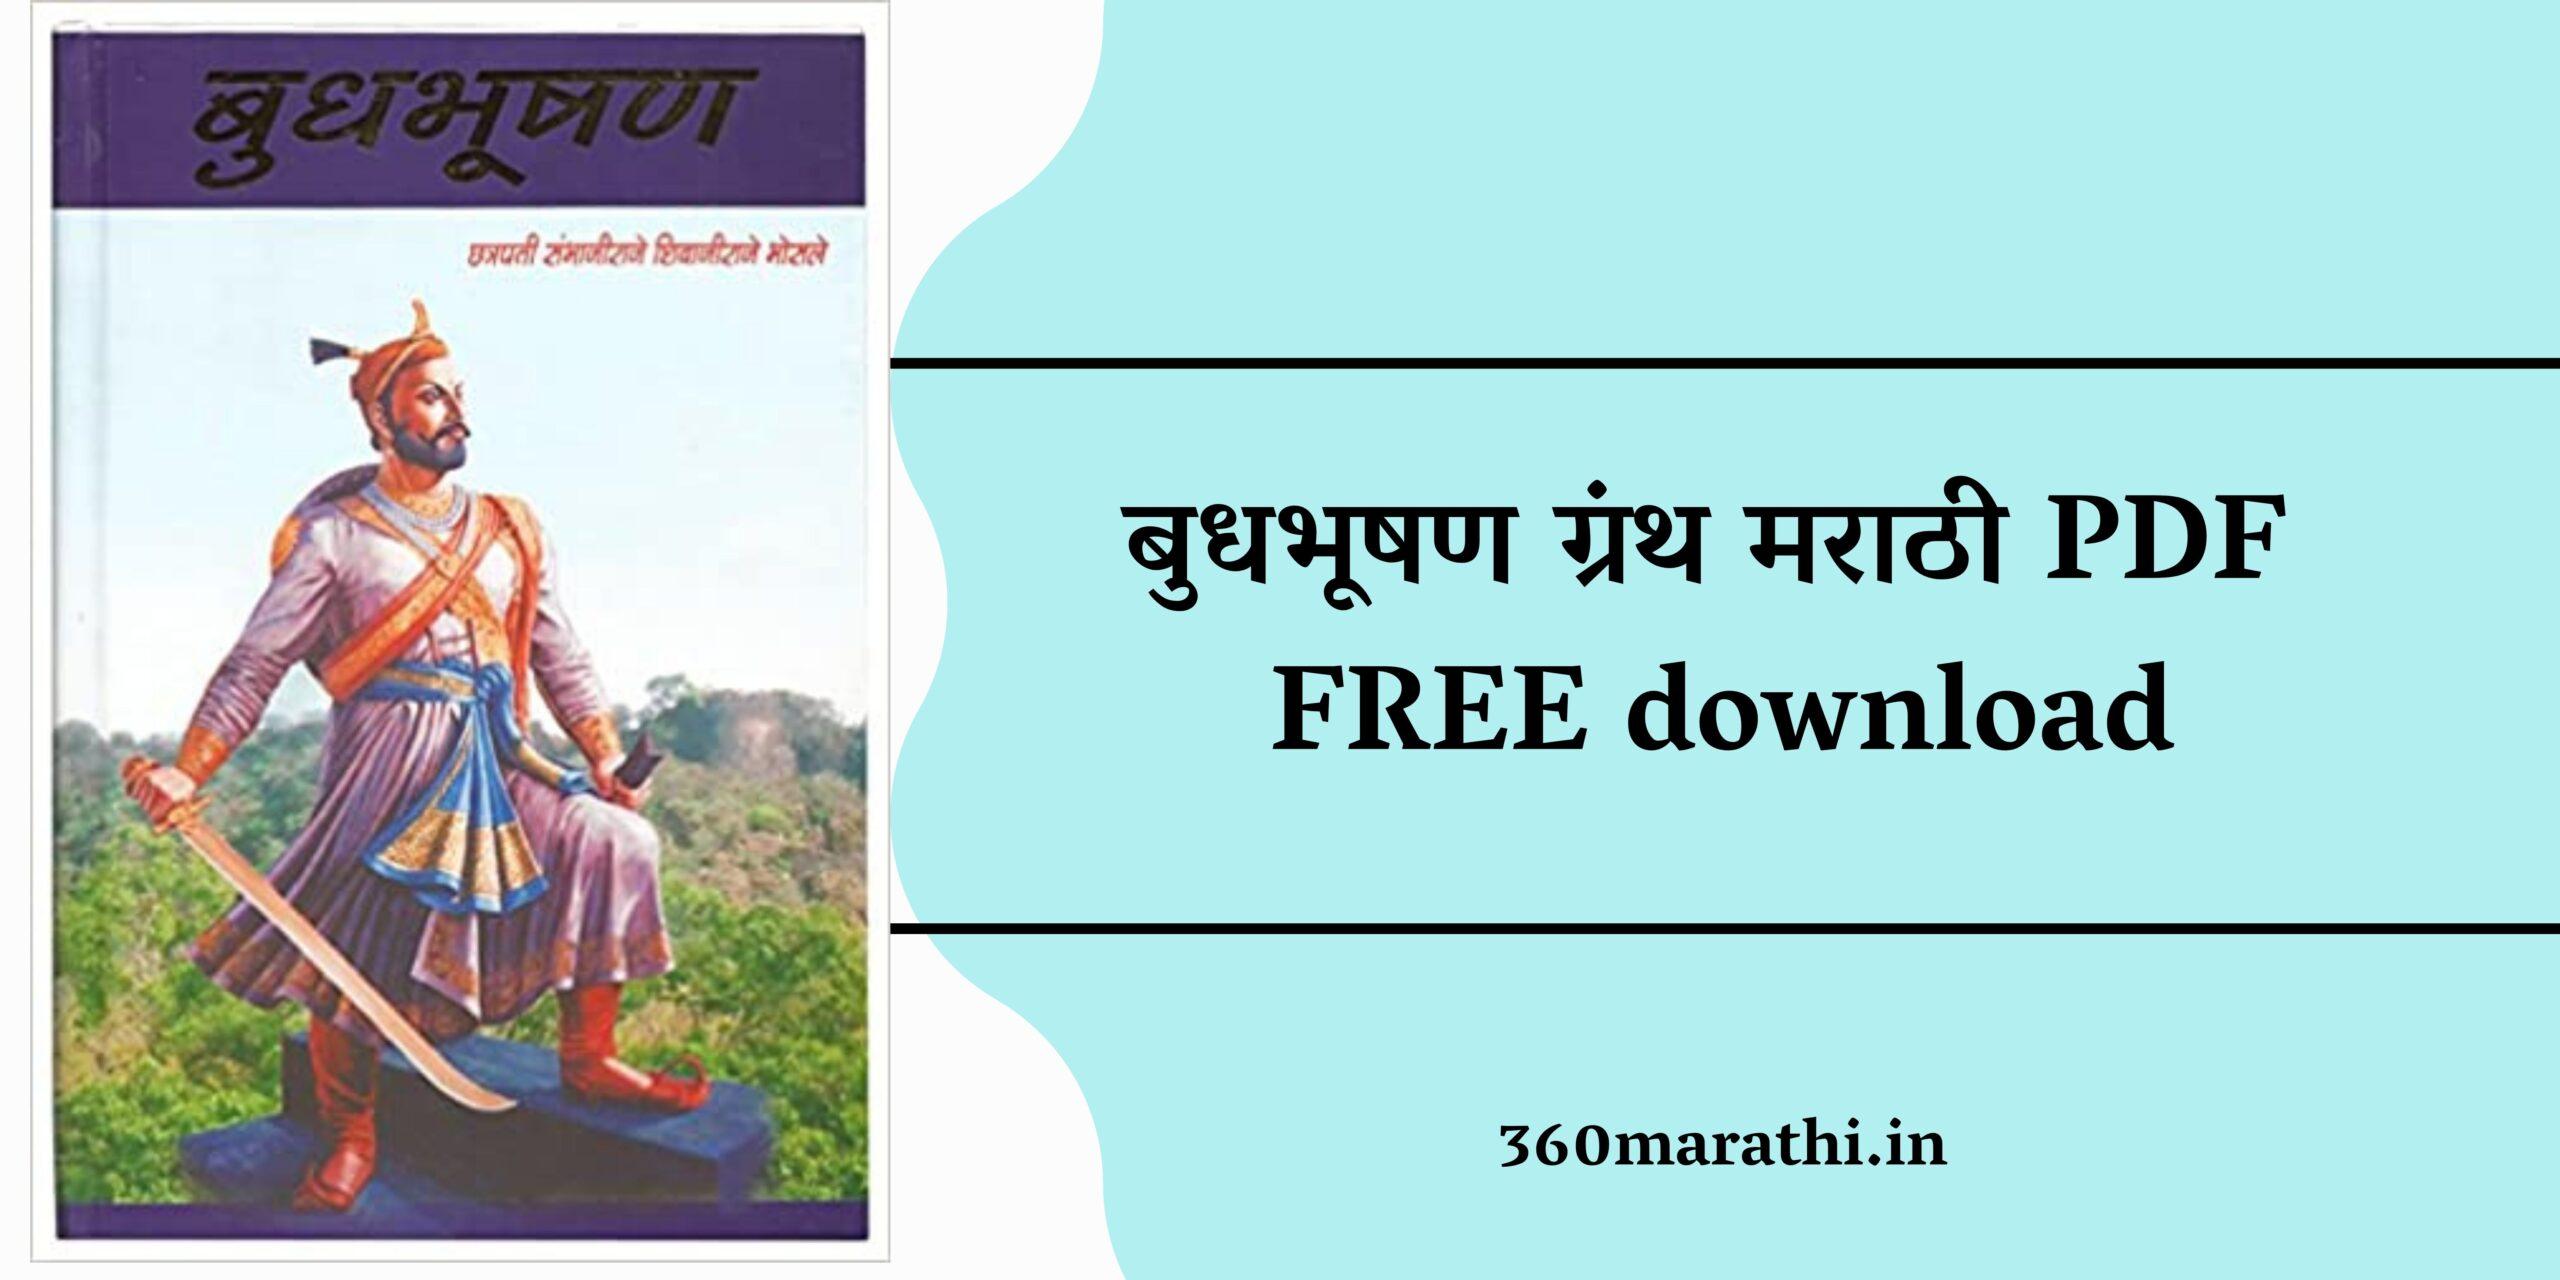 Budhbhushan PDF Marathi | बुधभूषण ग्रंथ मराठी PDF FREE download